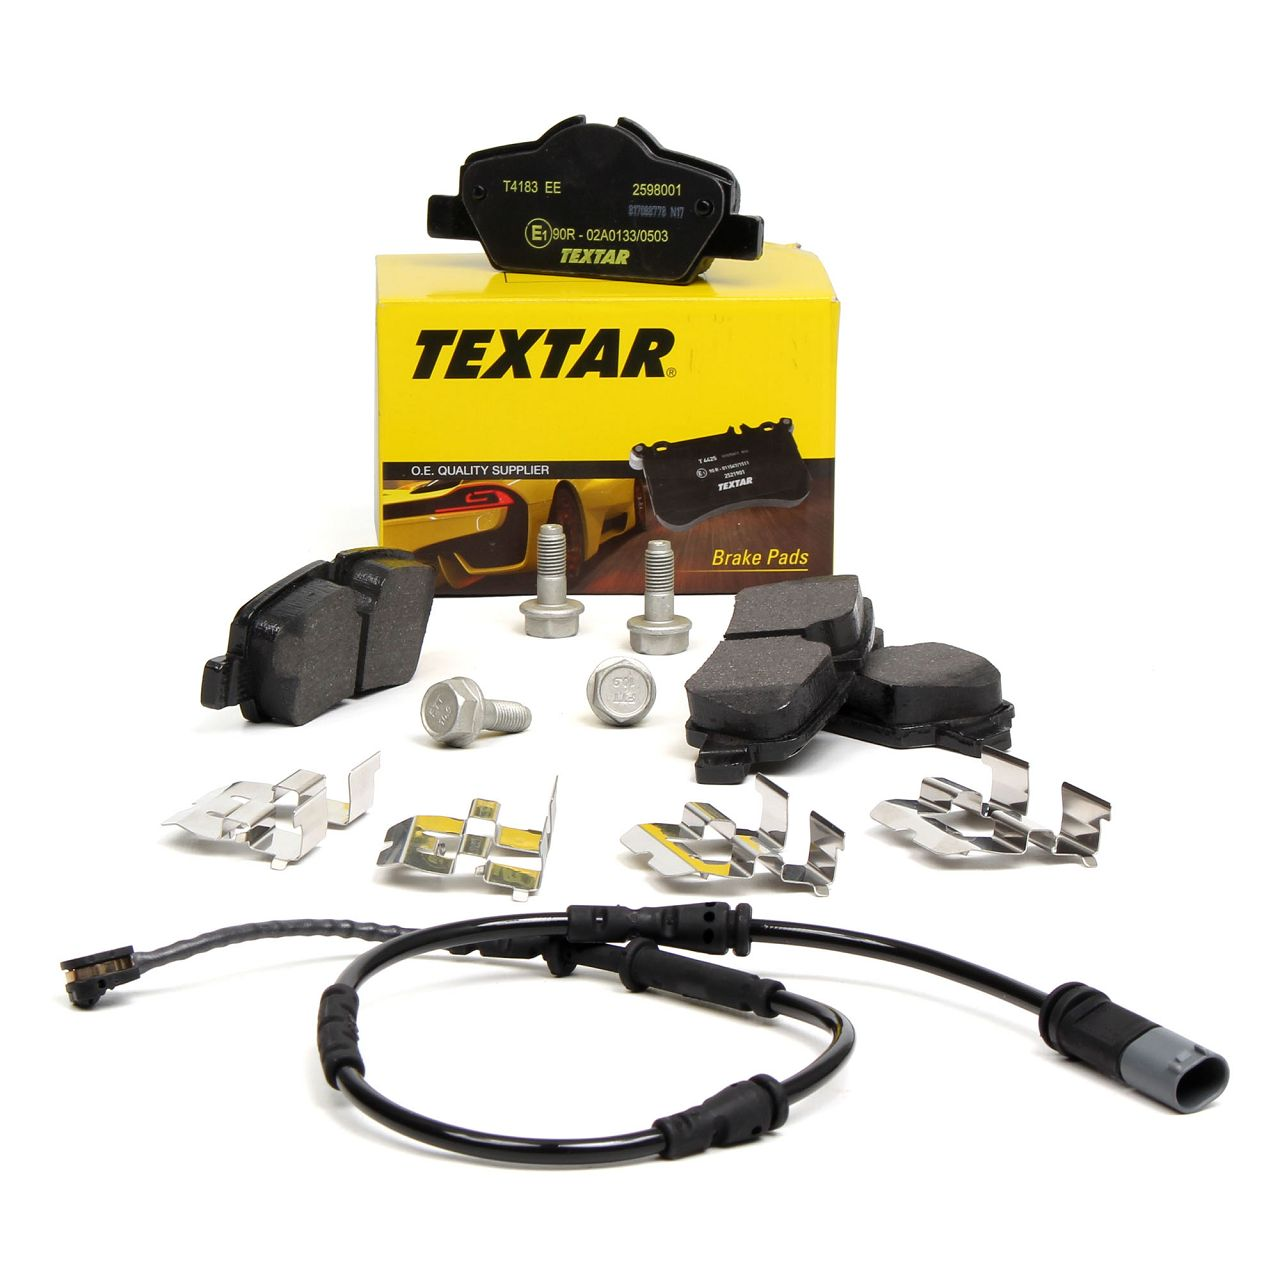 TEXTAR Bremsbeläge Bremsklötze + Warnkontakt für MINI F55 F56 CABRIO F57 hinten